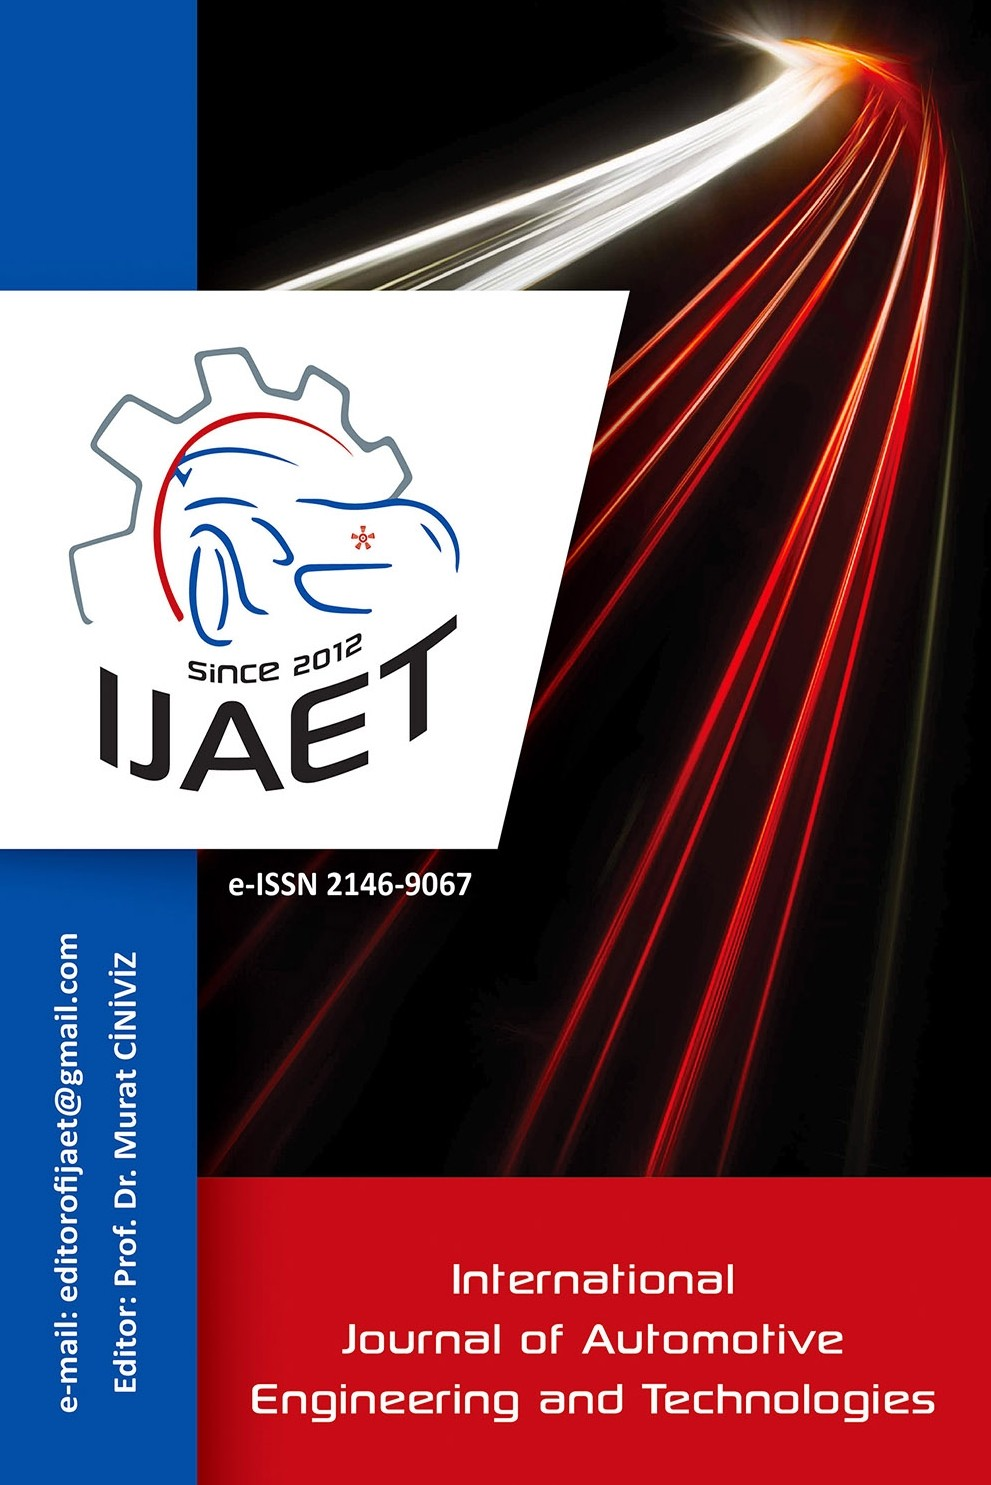 International Journal of Automotive Engineering and Technologies